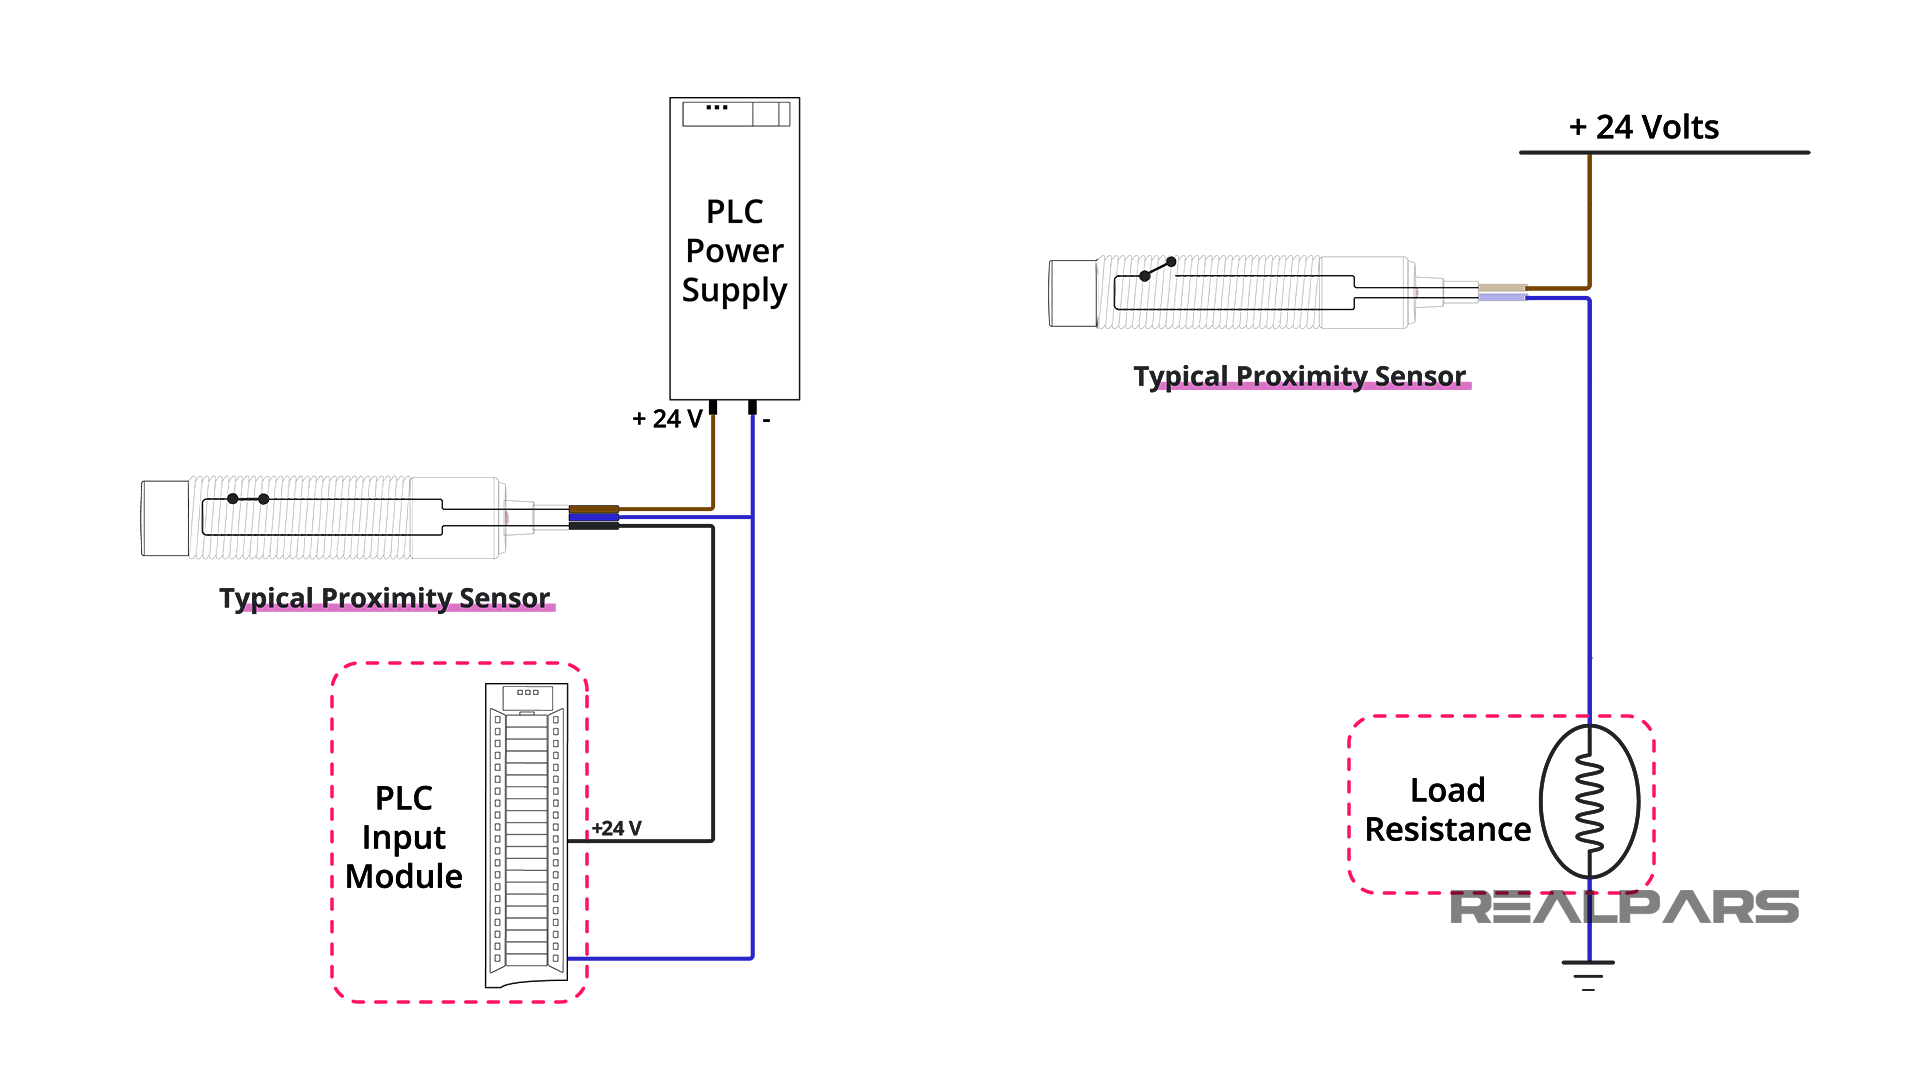 Proximity Sensor DI Signal